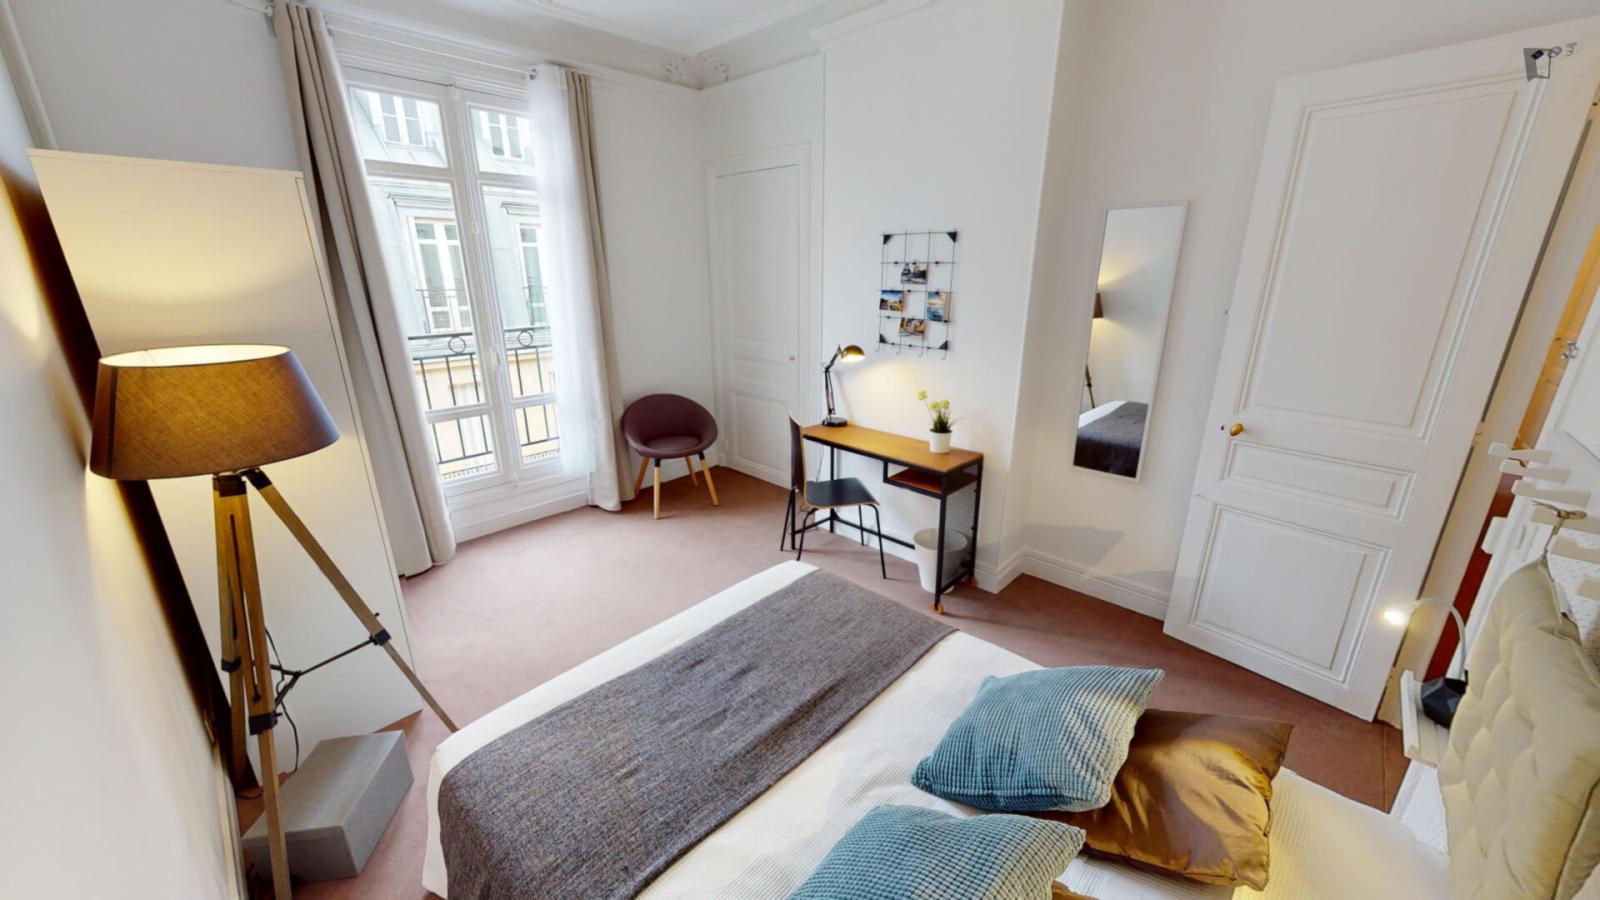 Boulevard Malesherbes, 17th arrondissement of Paris, FR-75 - 1,014 EUR/ month